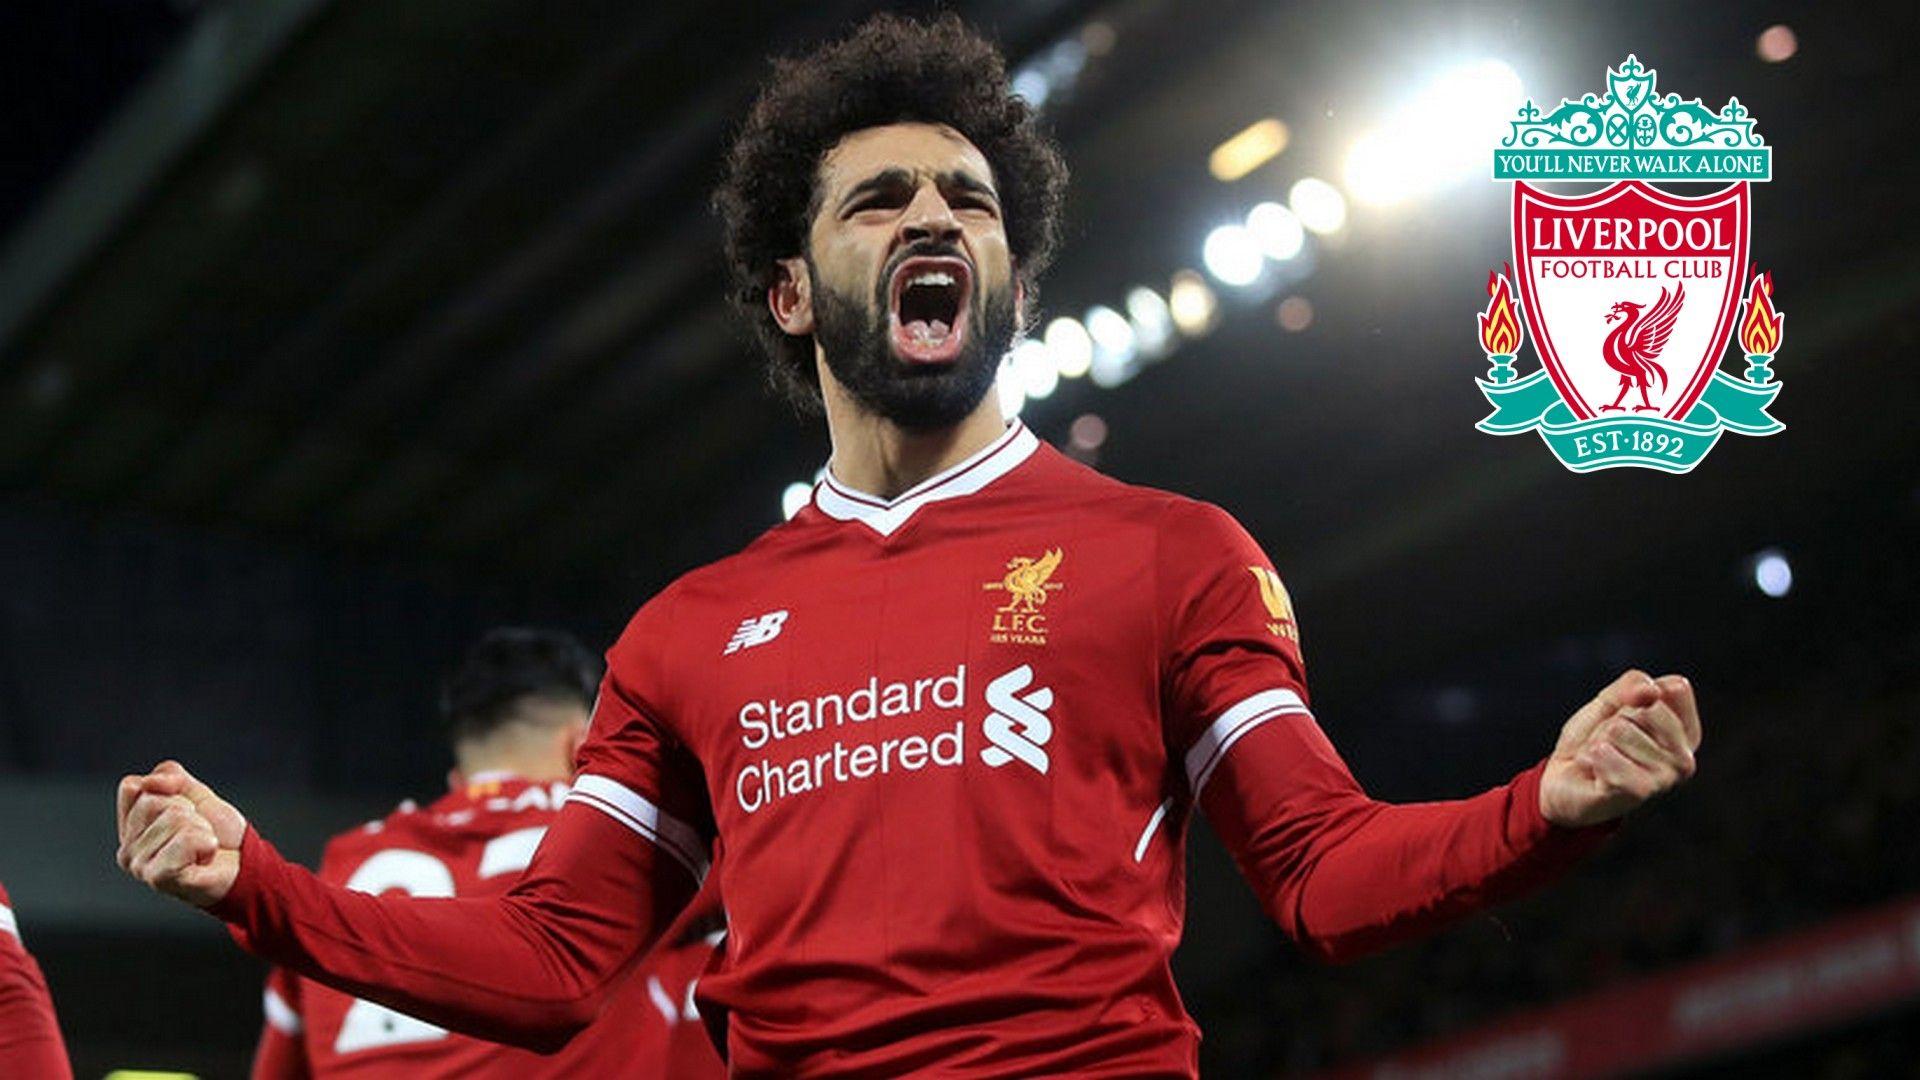 Liverpool Mohamed Salah Wallpaper Best Wallpaper Hd